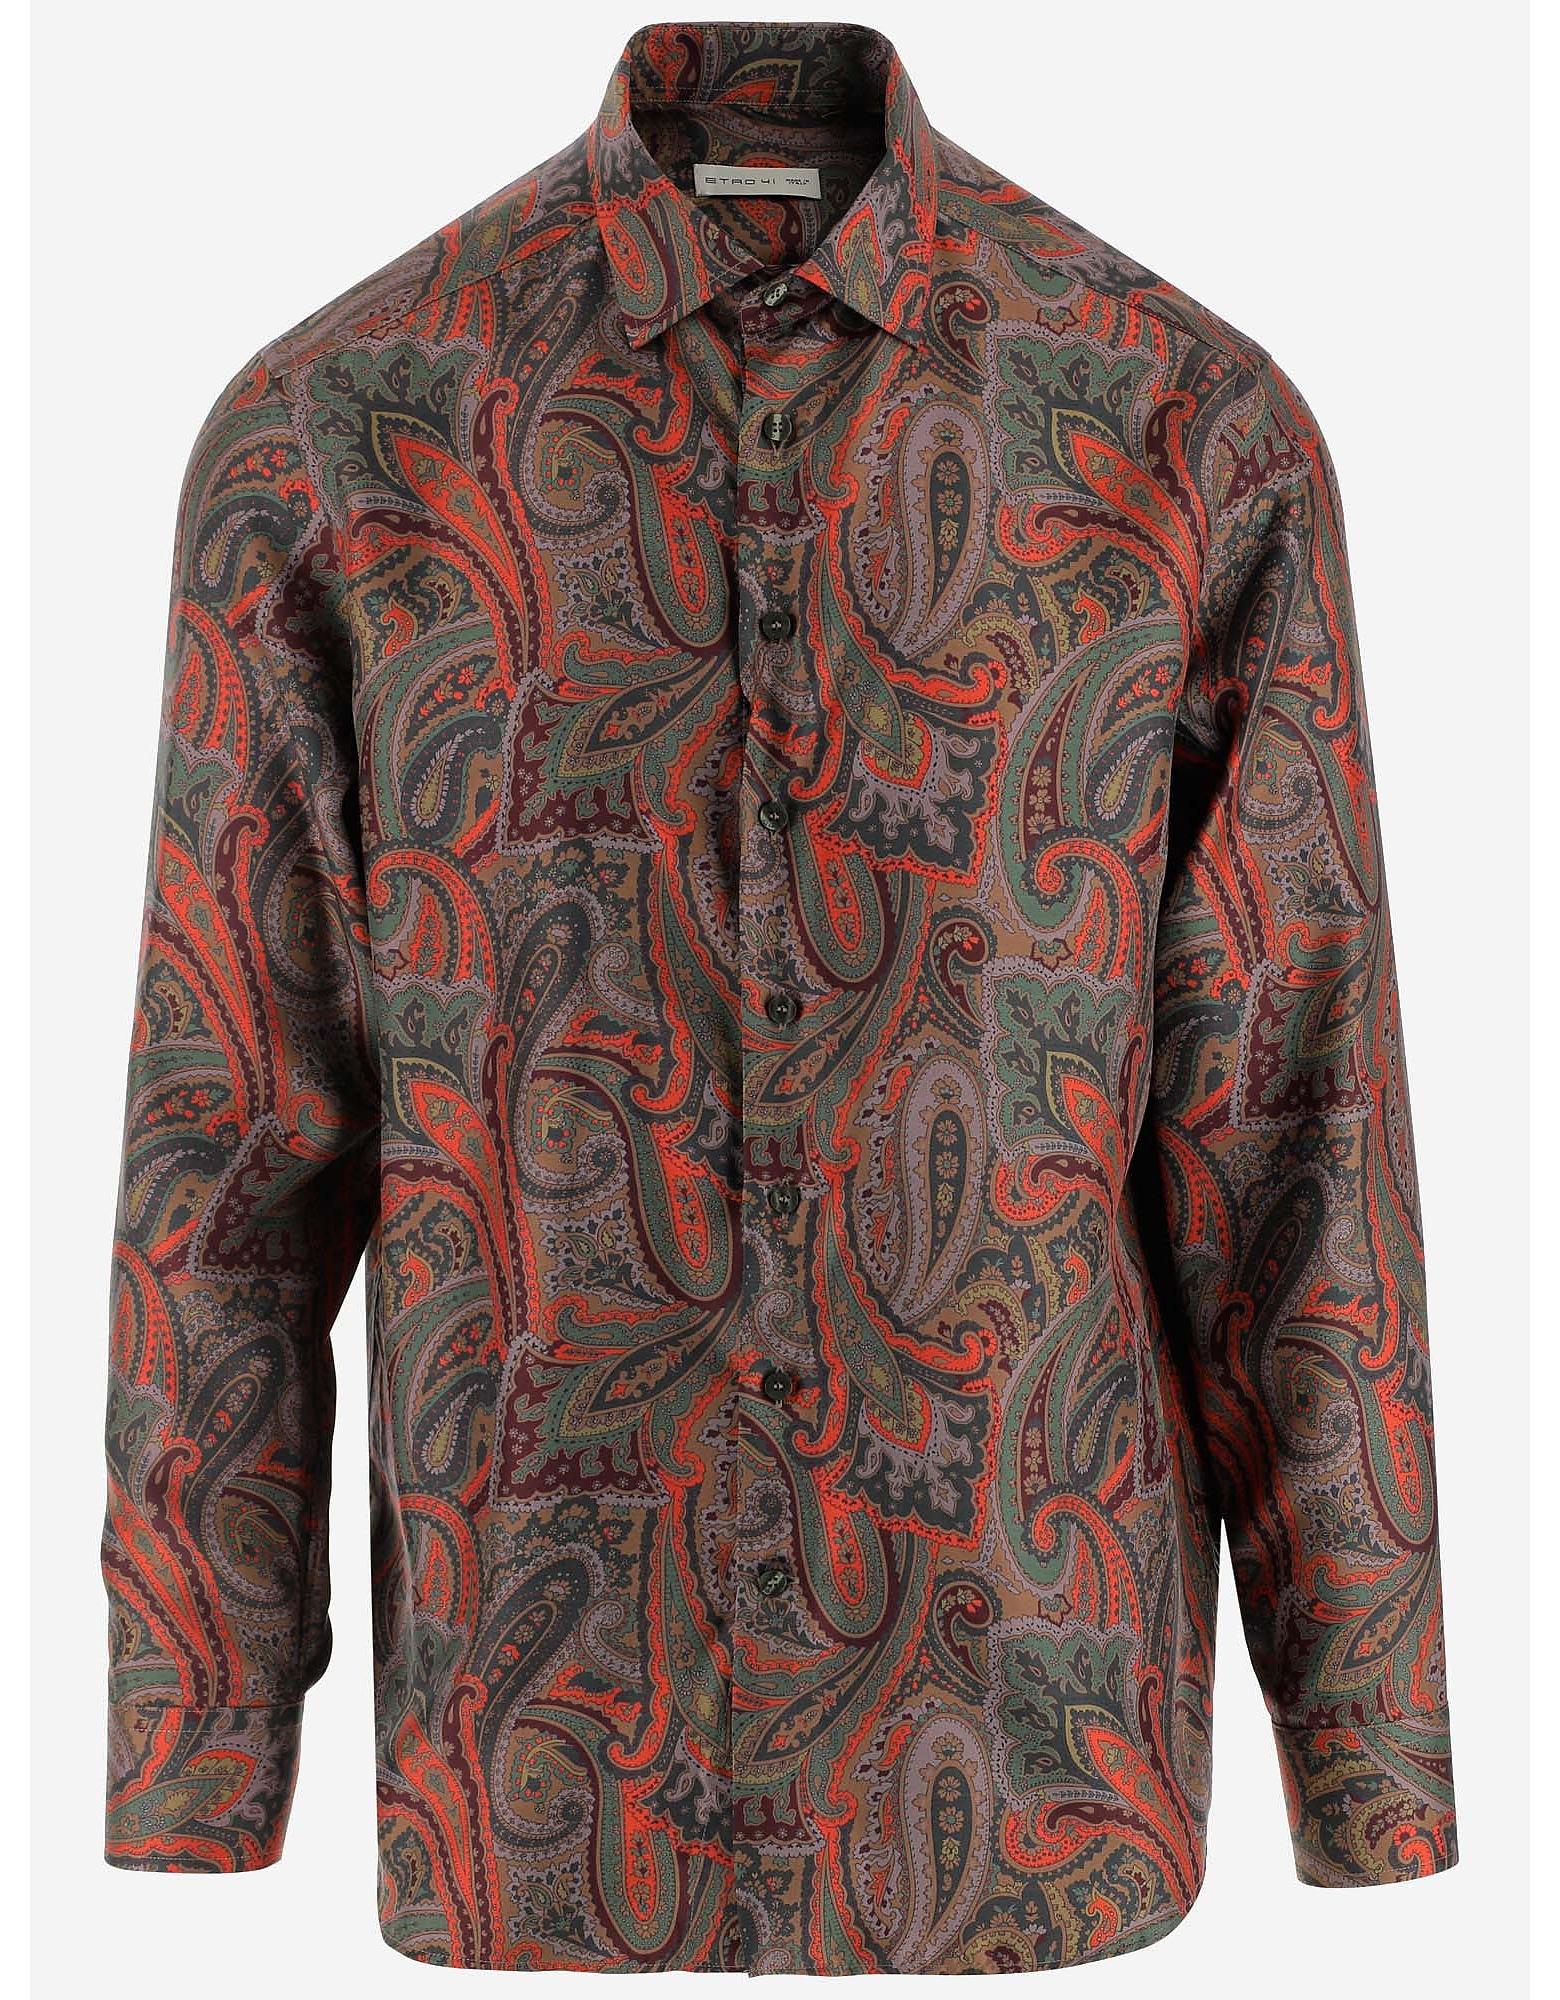 Etro Designer Shirts, Men's Casual Shirt